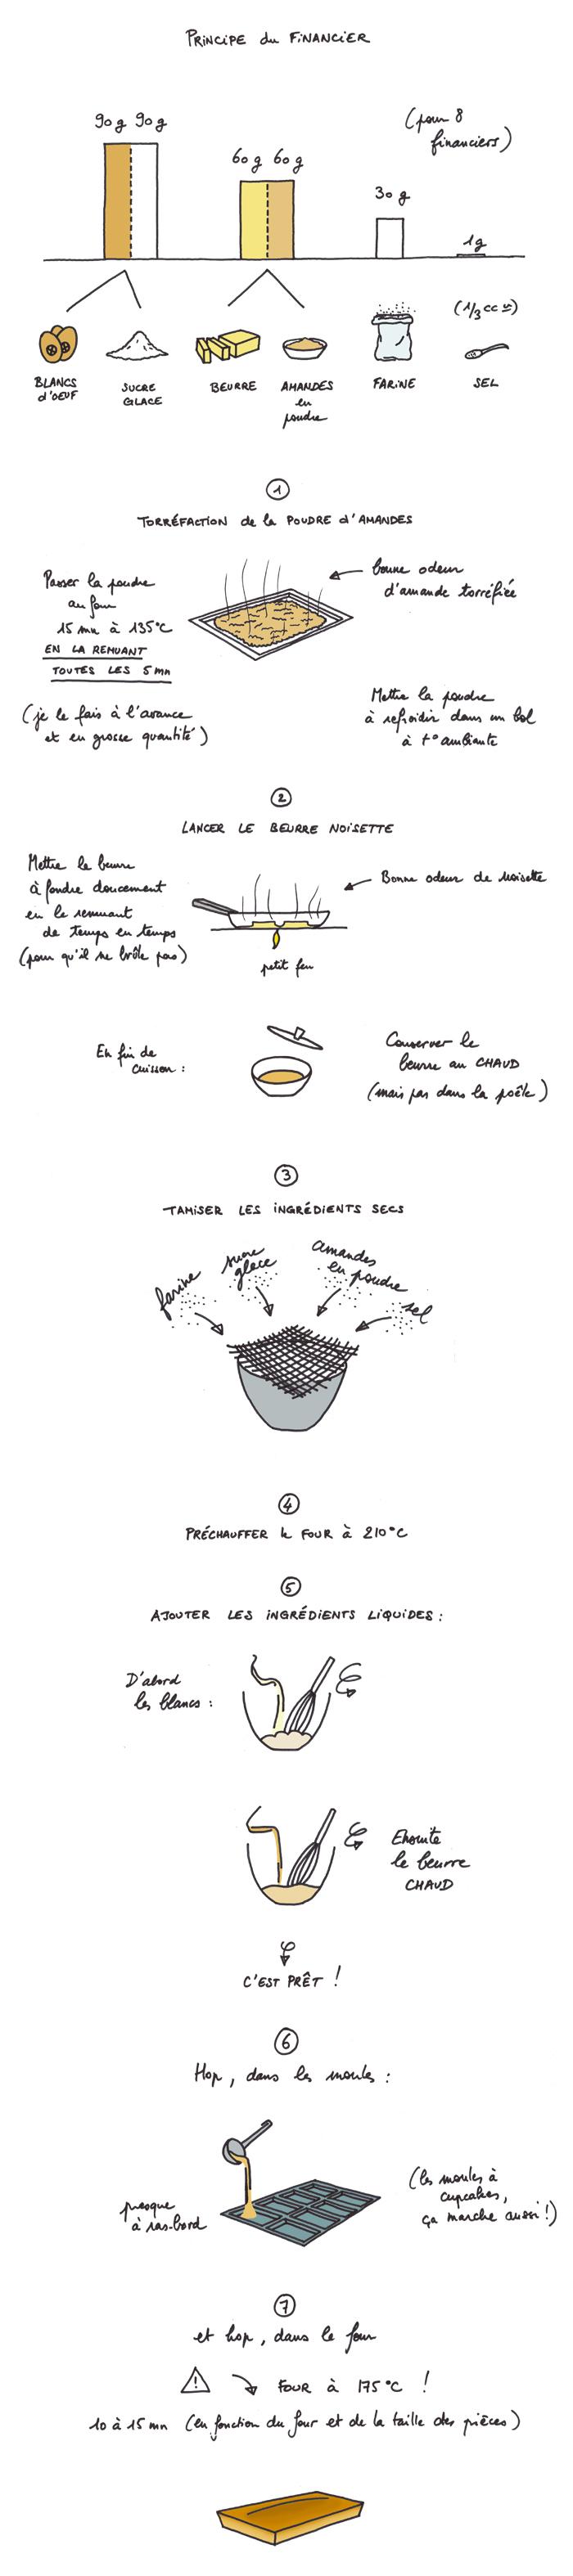 Financier_dessin_700b